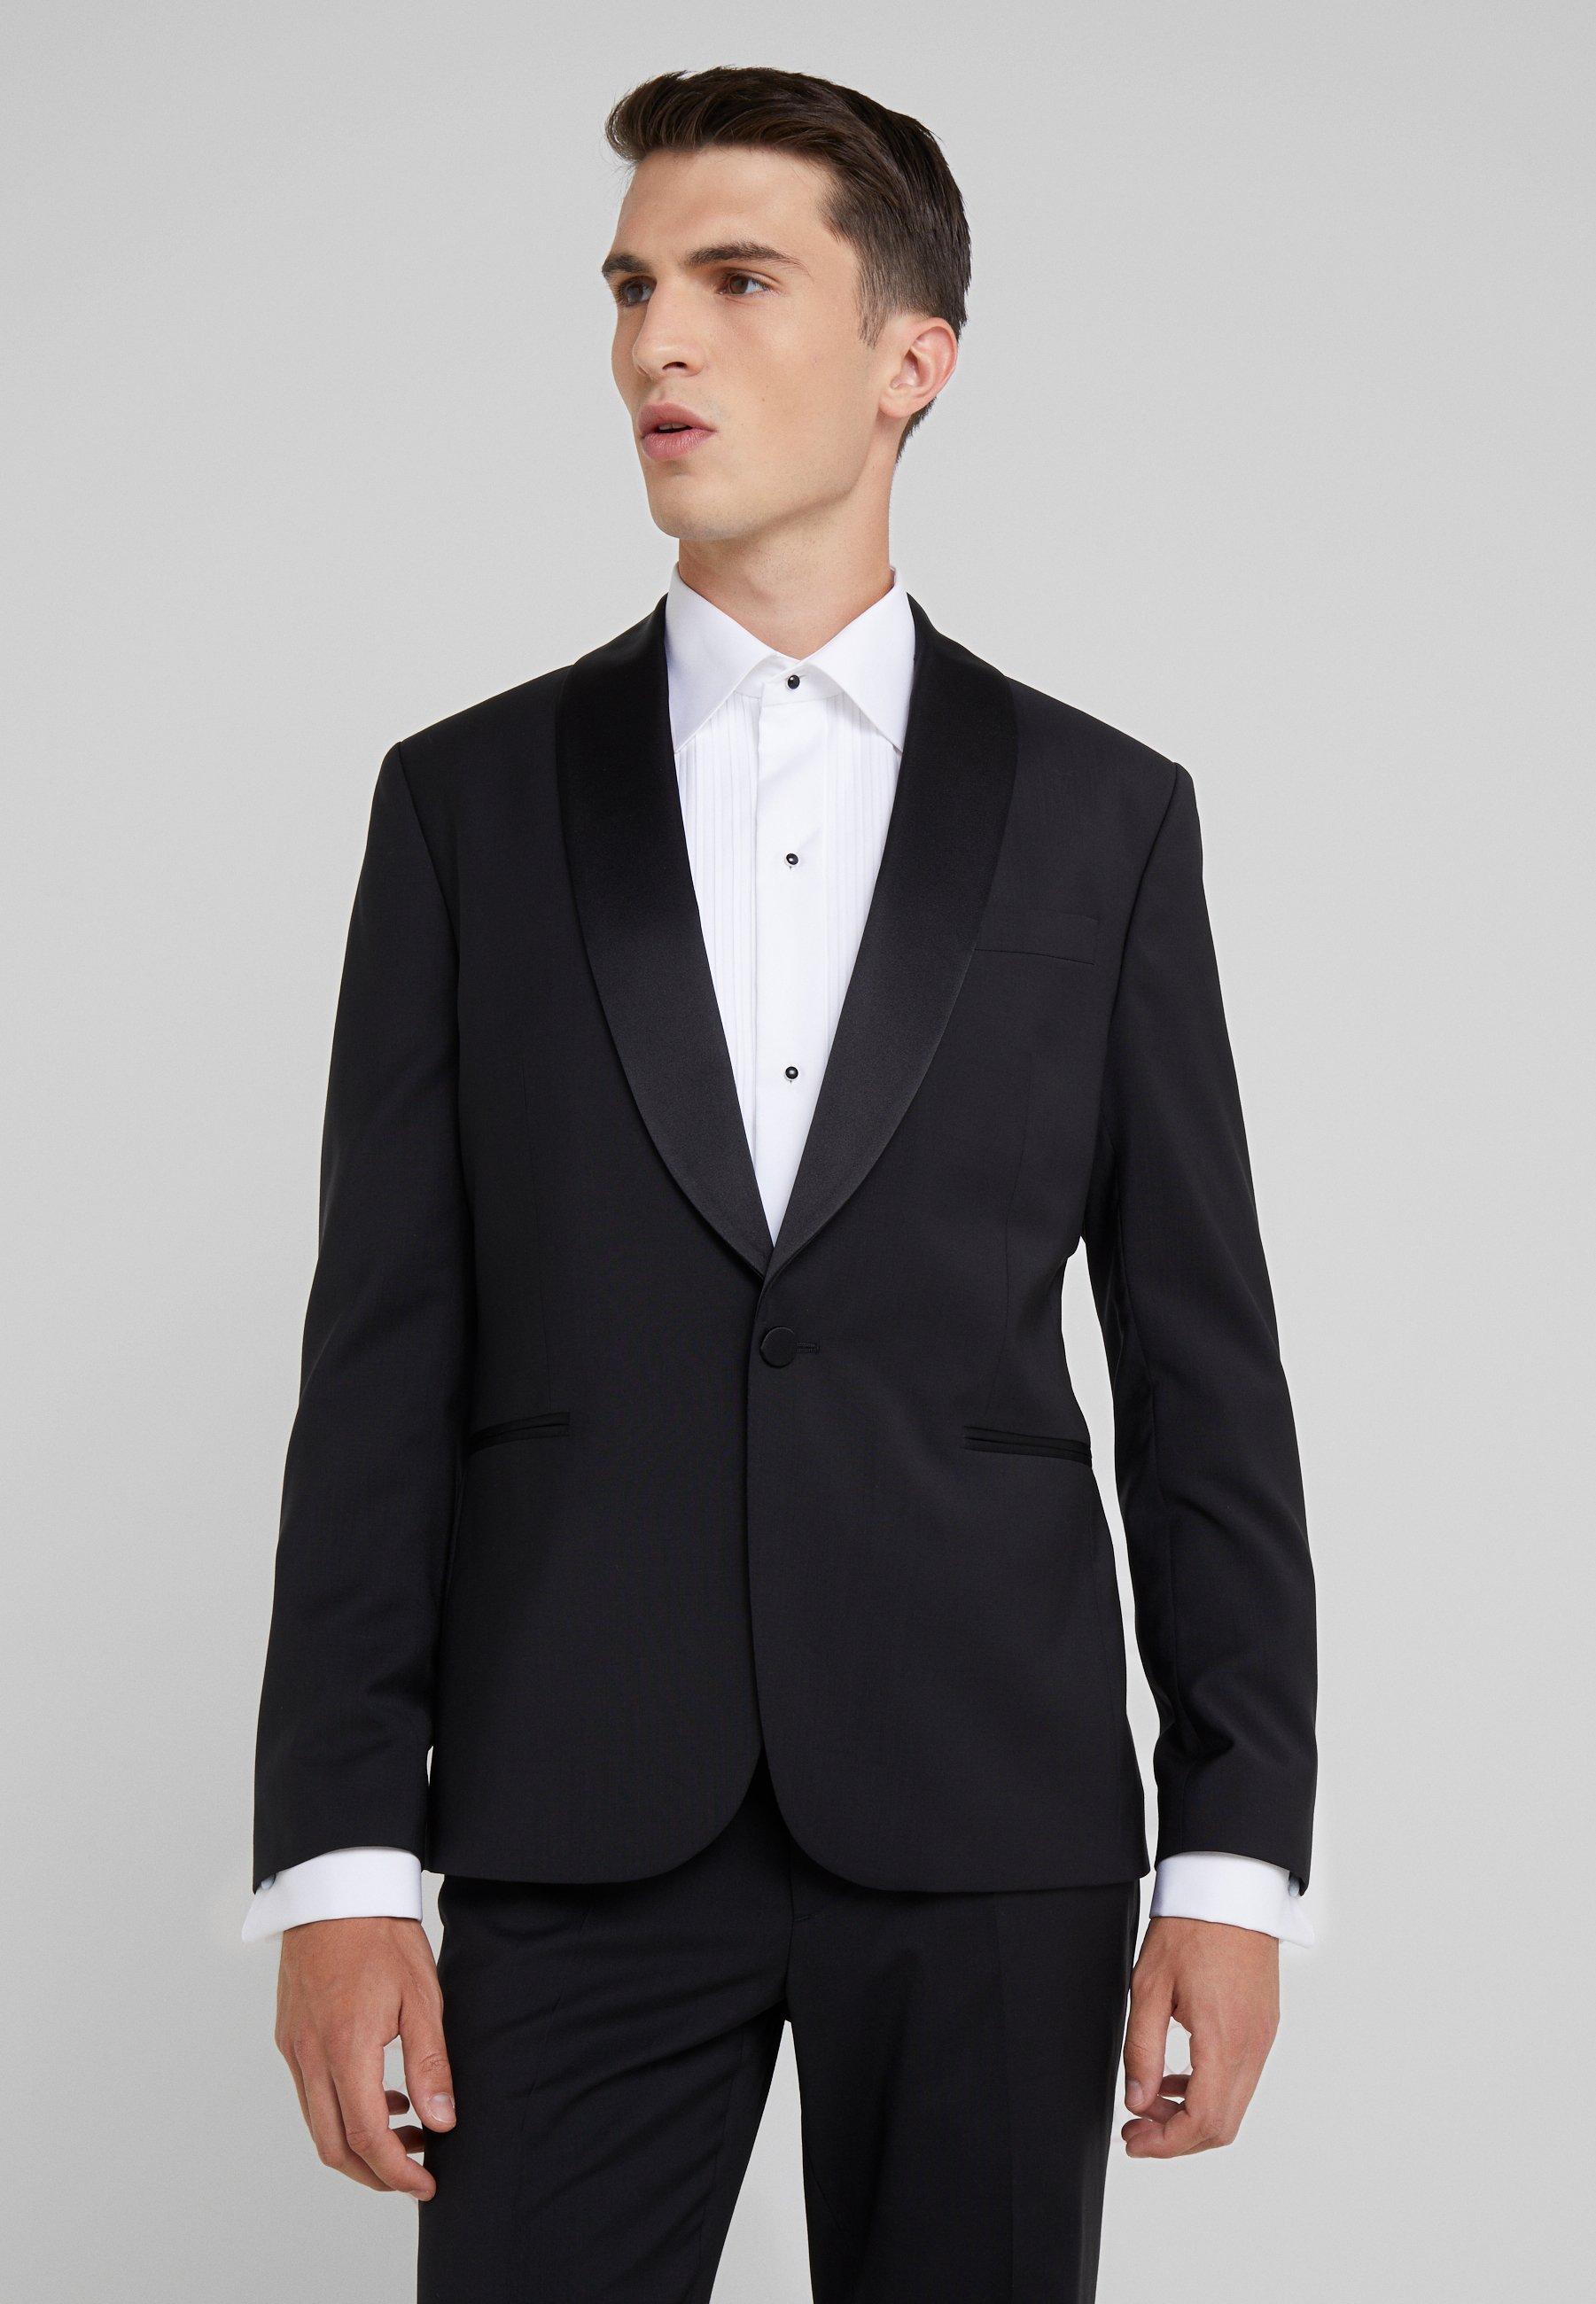 Uomo SAVILE TUX COMFORT - Giacca elegante